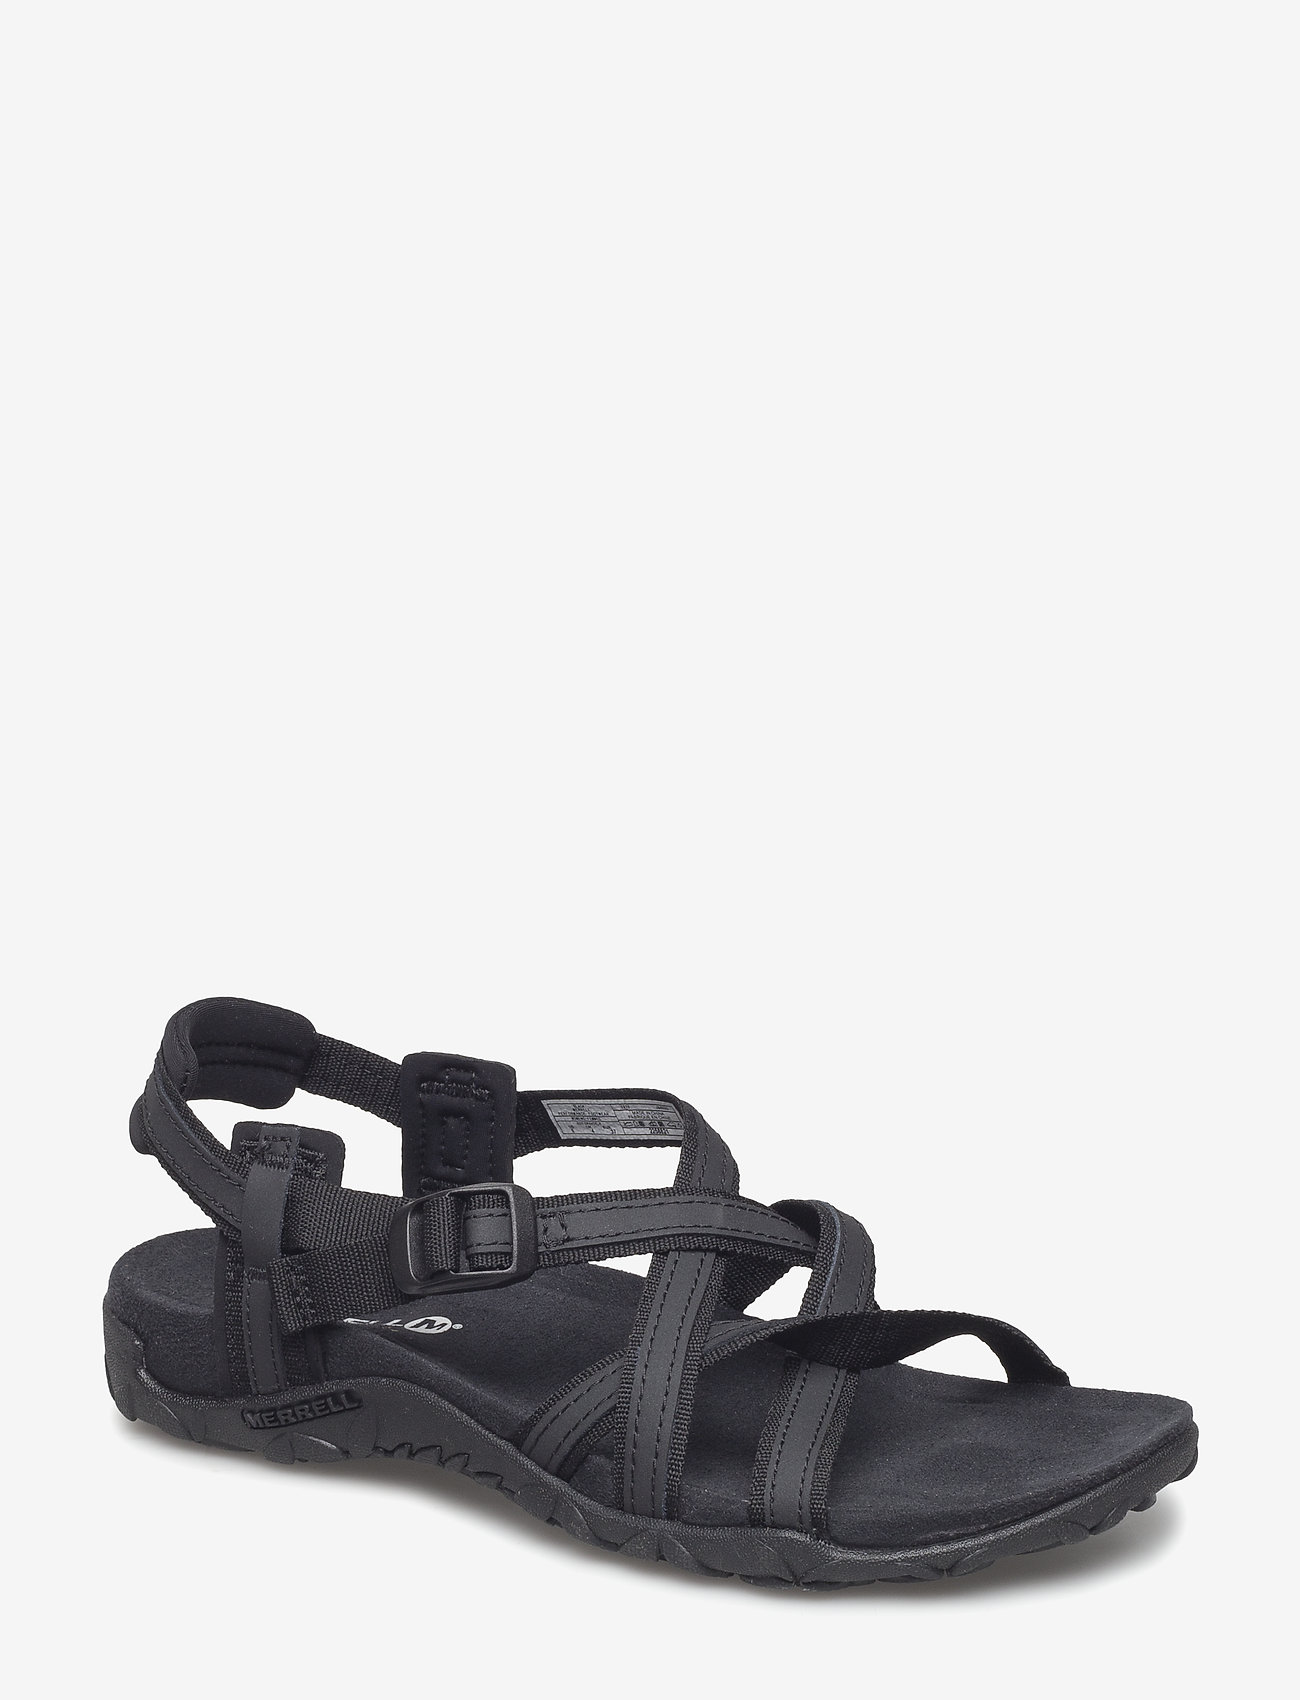 Merrell - Terran Ari Lattice Black - hiking sandals - black - 0